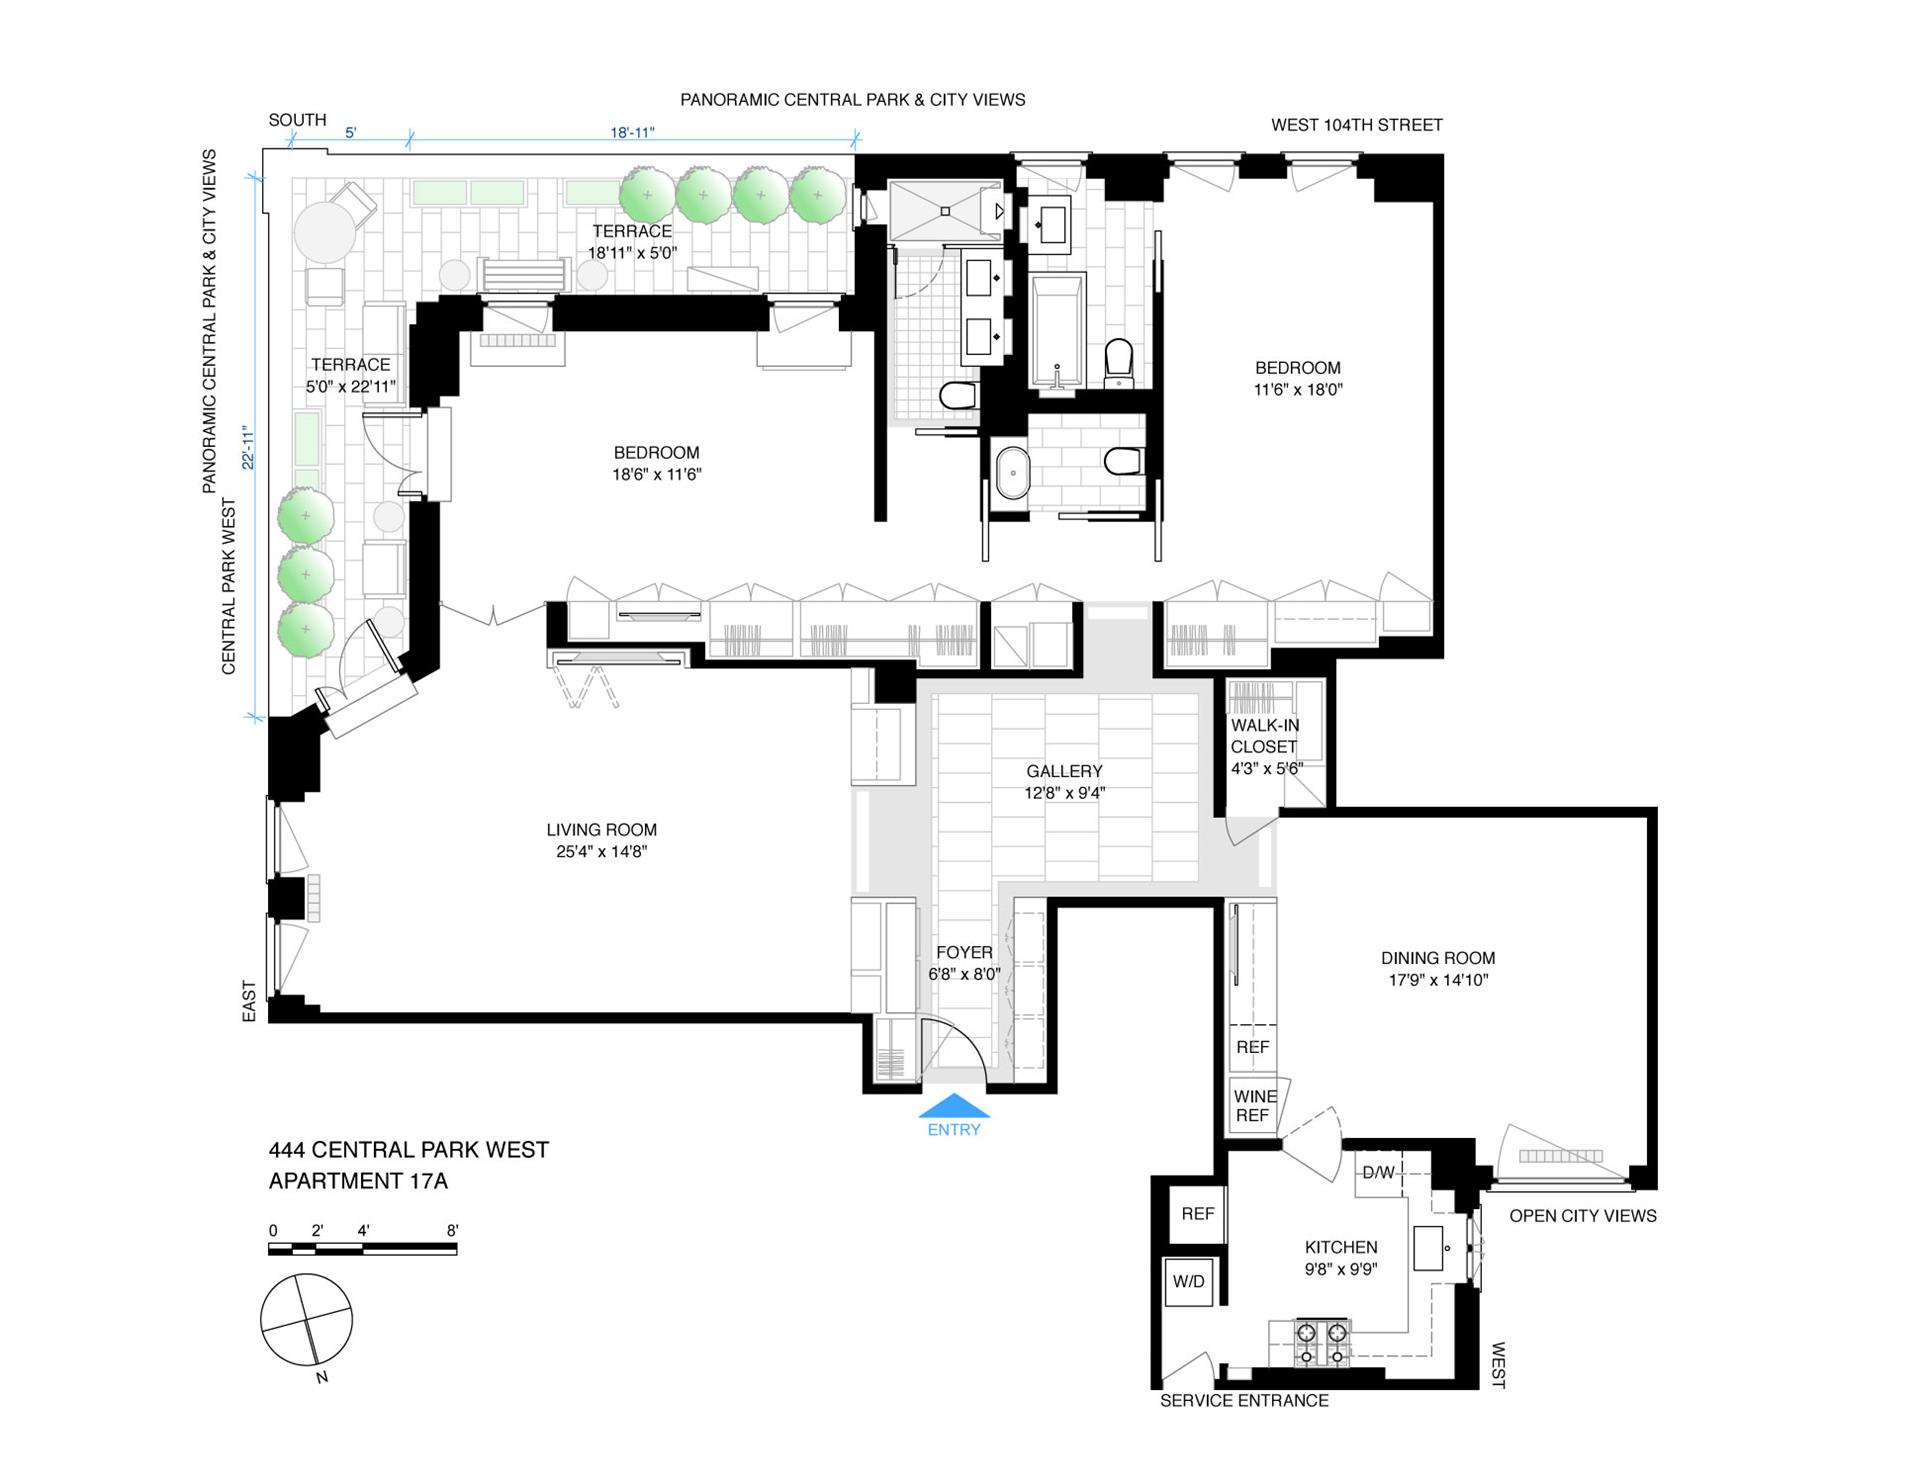 Floor plan of 444 Central Park West, 17A - Upper West Side, New York